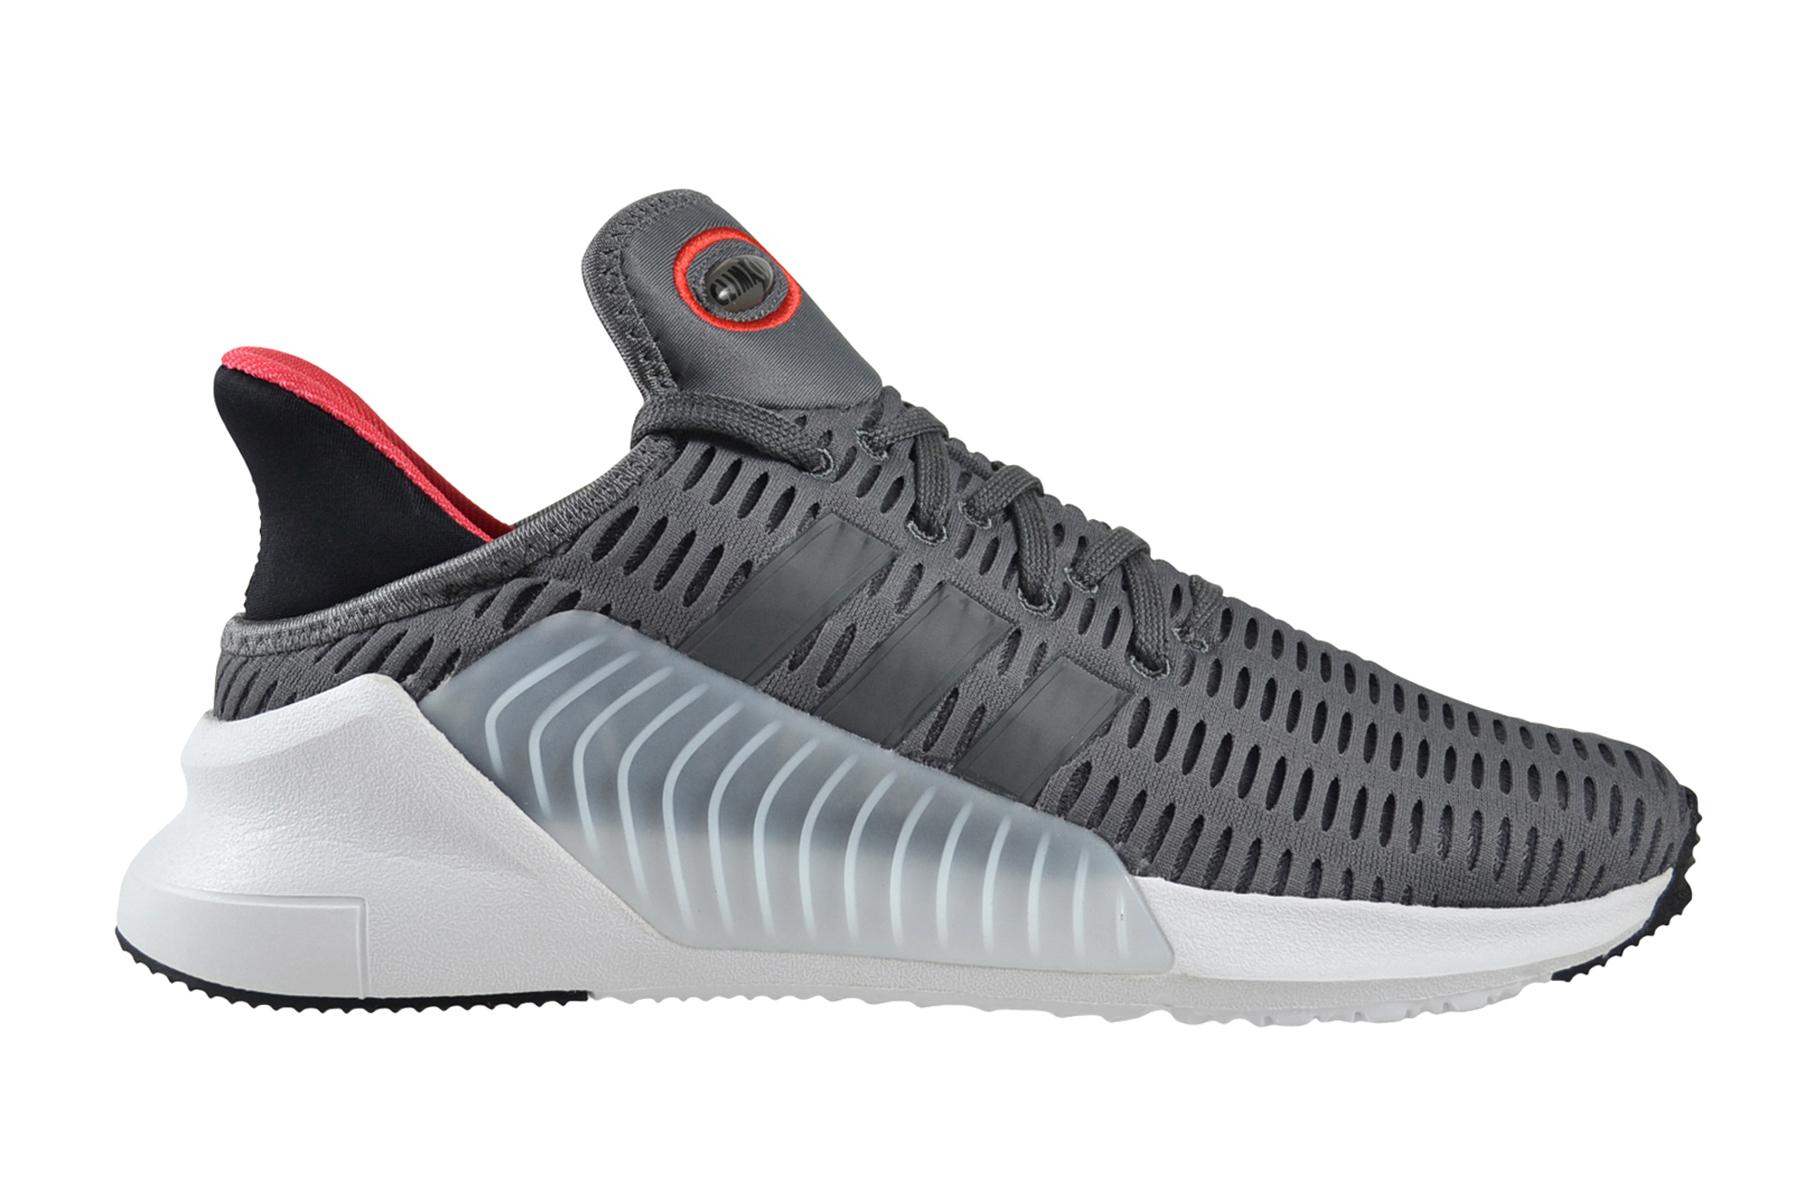 factory price best choice uk cheap sale Details zu Adidas Climacool 02 17 grey footwear white Sneaker Schuhe grau  CG3346